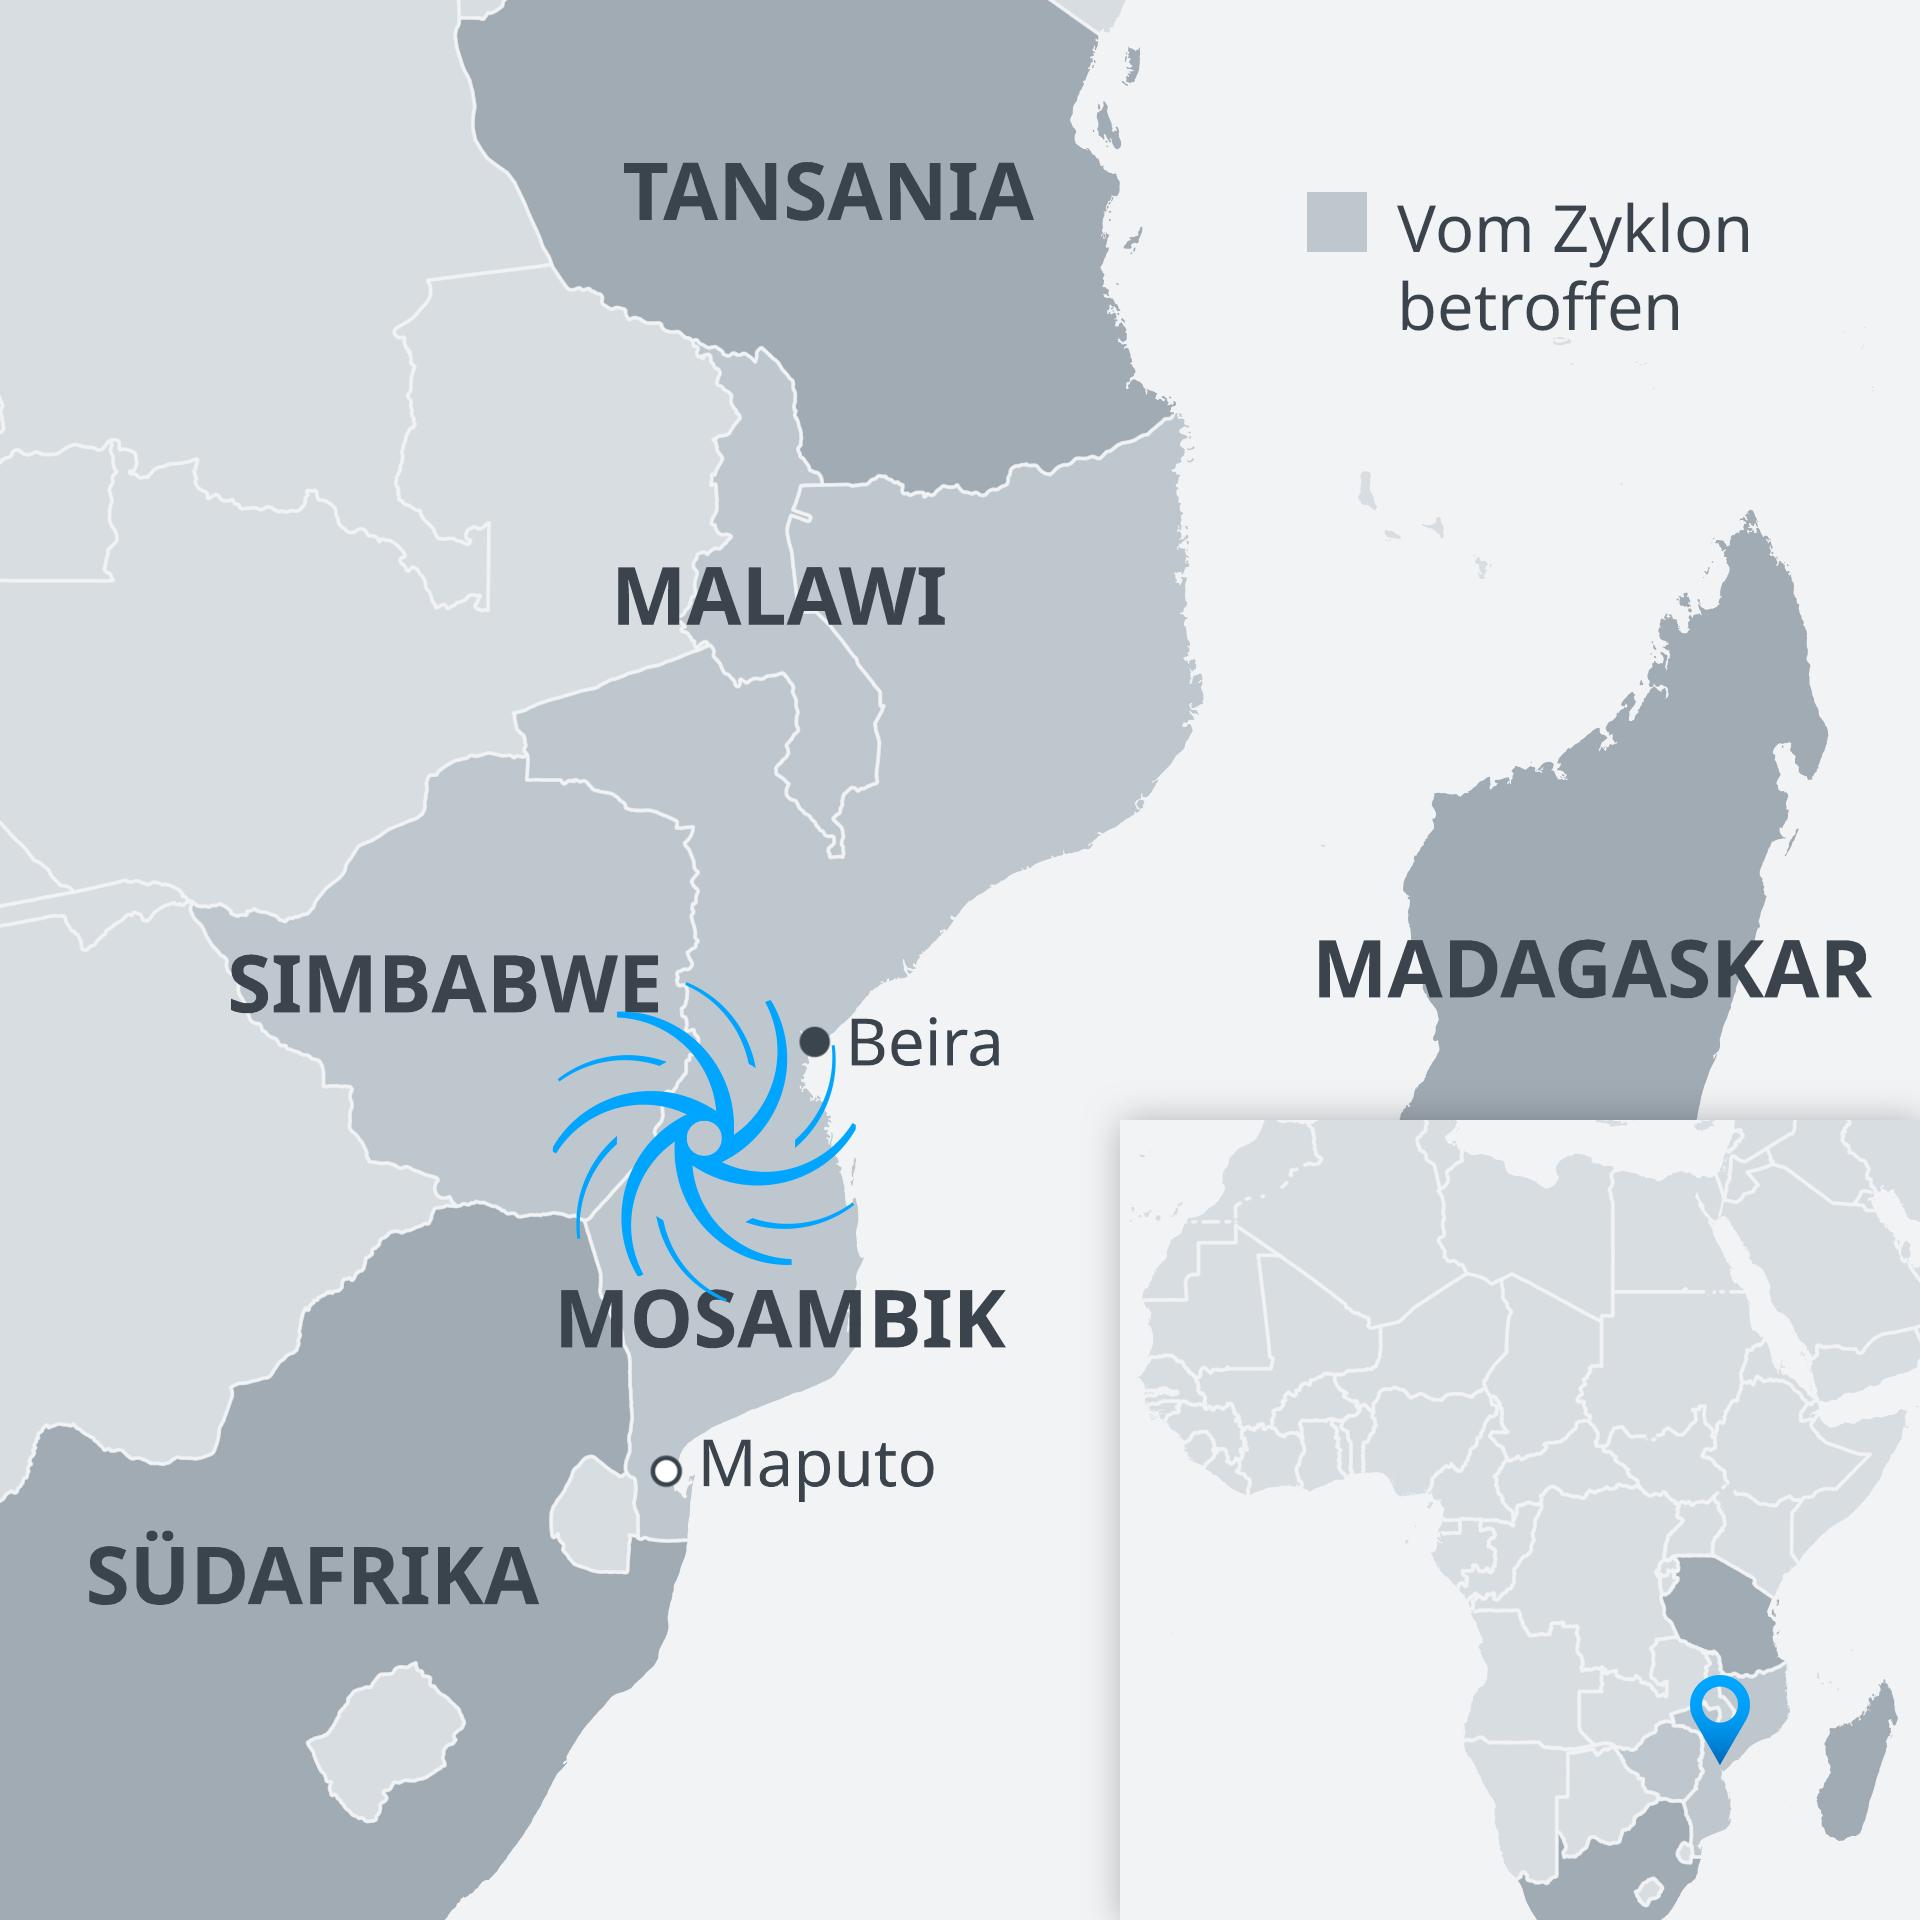 Karte Zyklon Idai Mosambik v2 DE